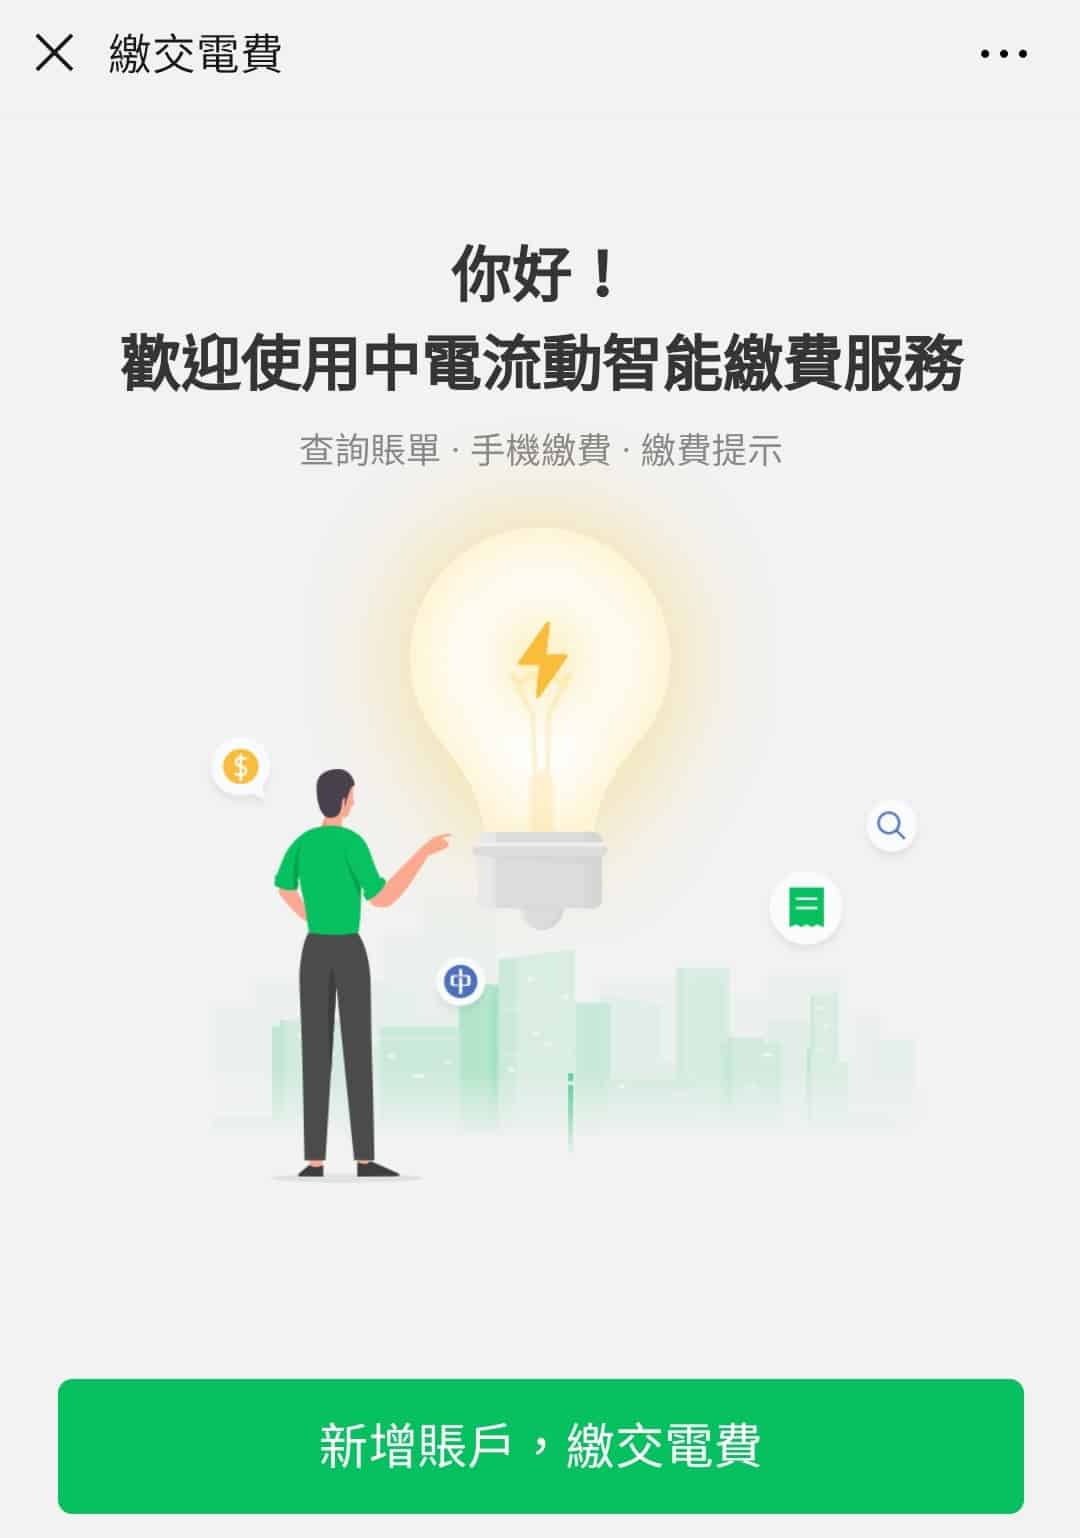 【WeChat Pay】可以繳交「中電」帳單(含教學) | POINTS852